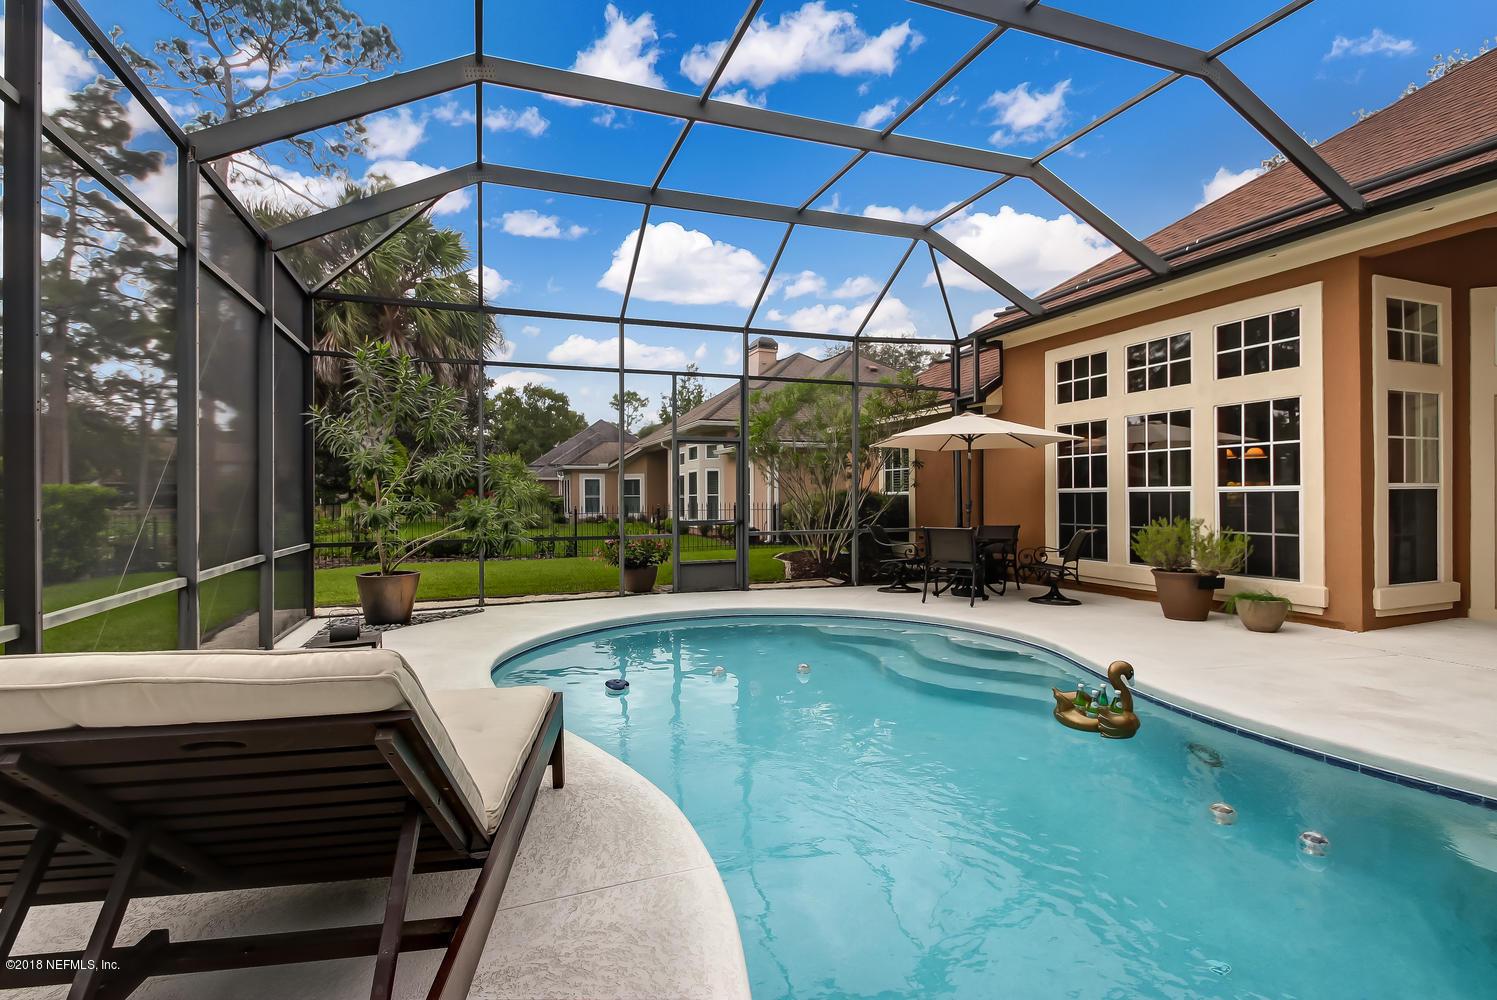 4003 JEBB ISLAND, JACKSONVILLE, FLORIDA 32224, 4 Bedrooms Bedrooms, ,3 BathroomsBathrooms,Residential - single family,For sale,JEBB ISLAND,956337